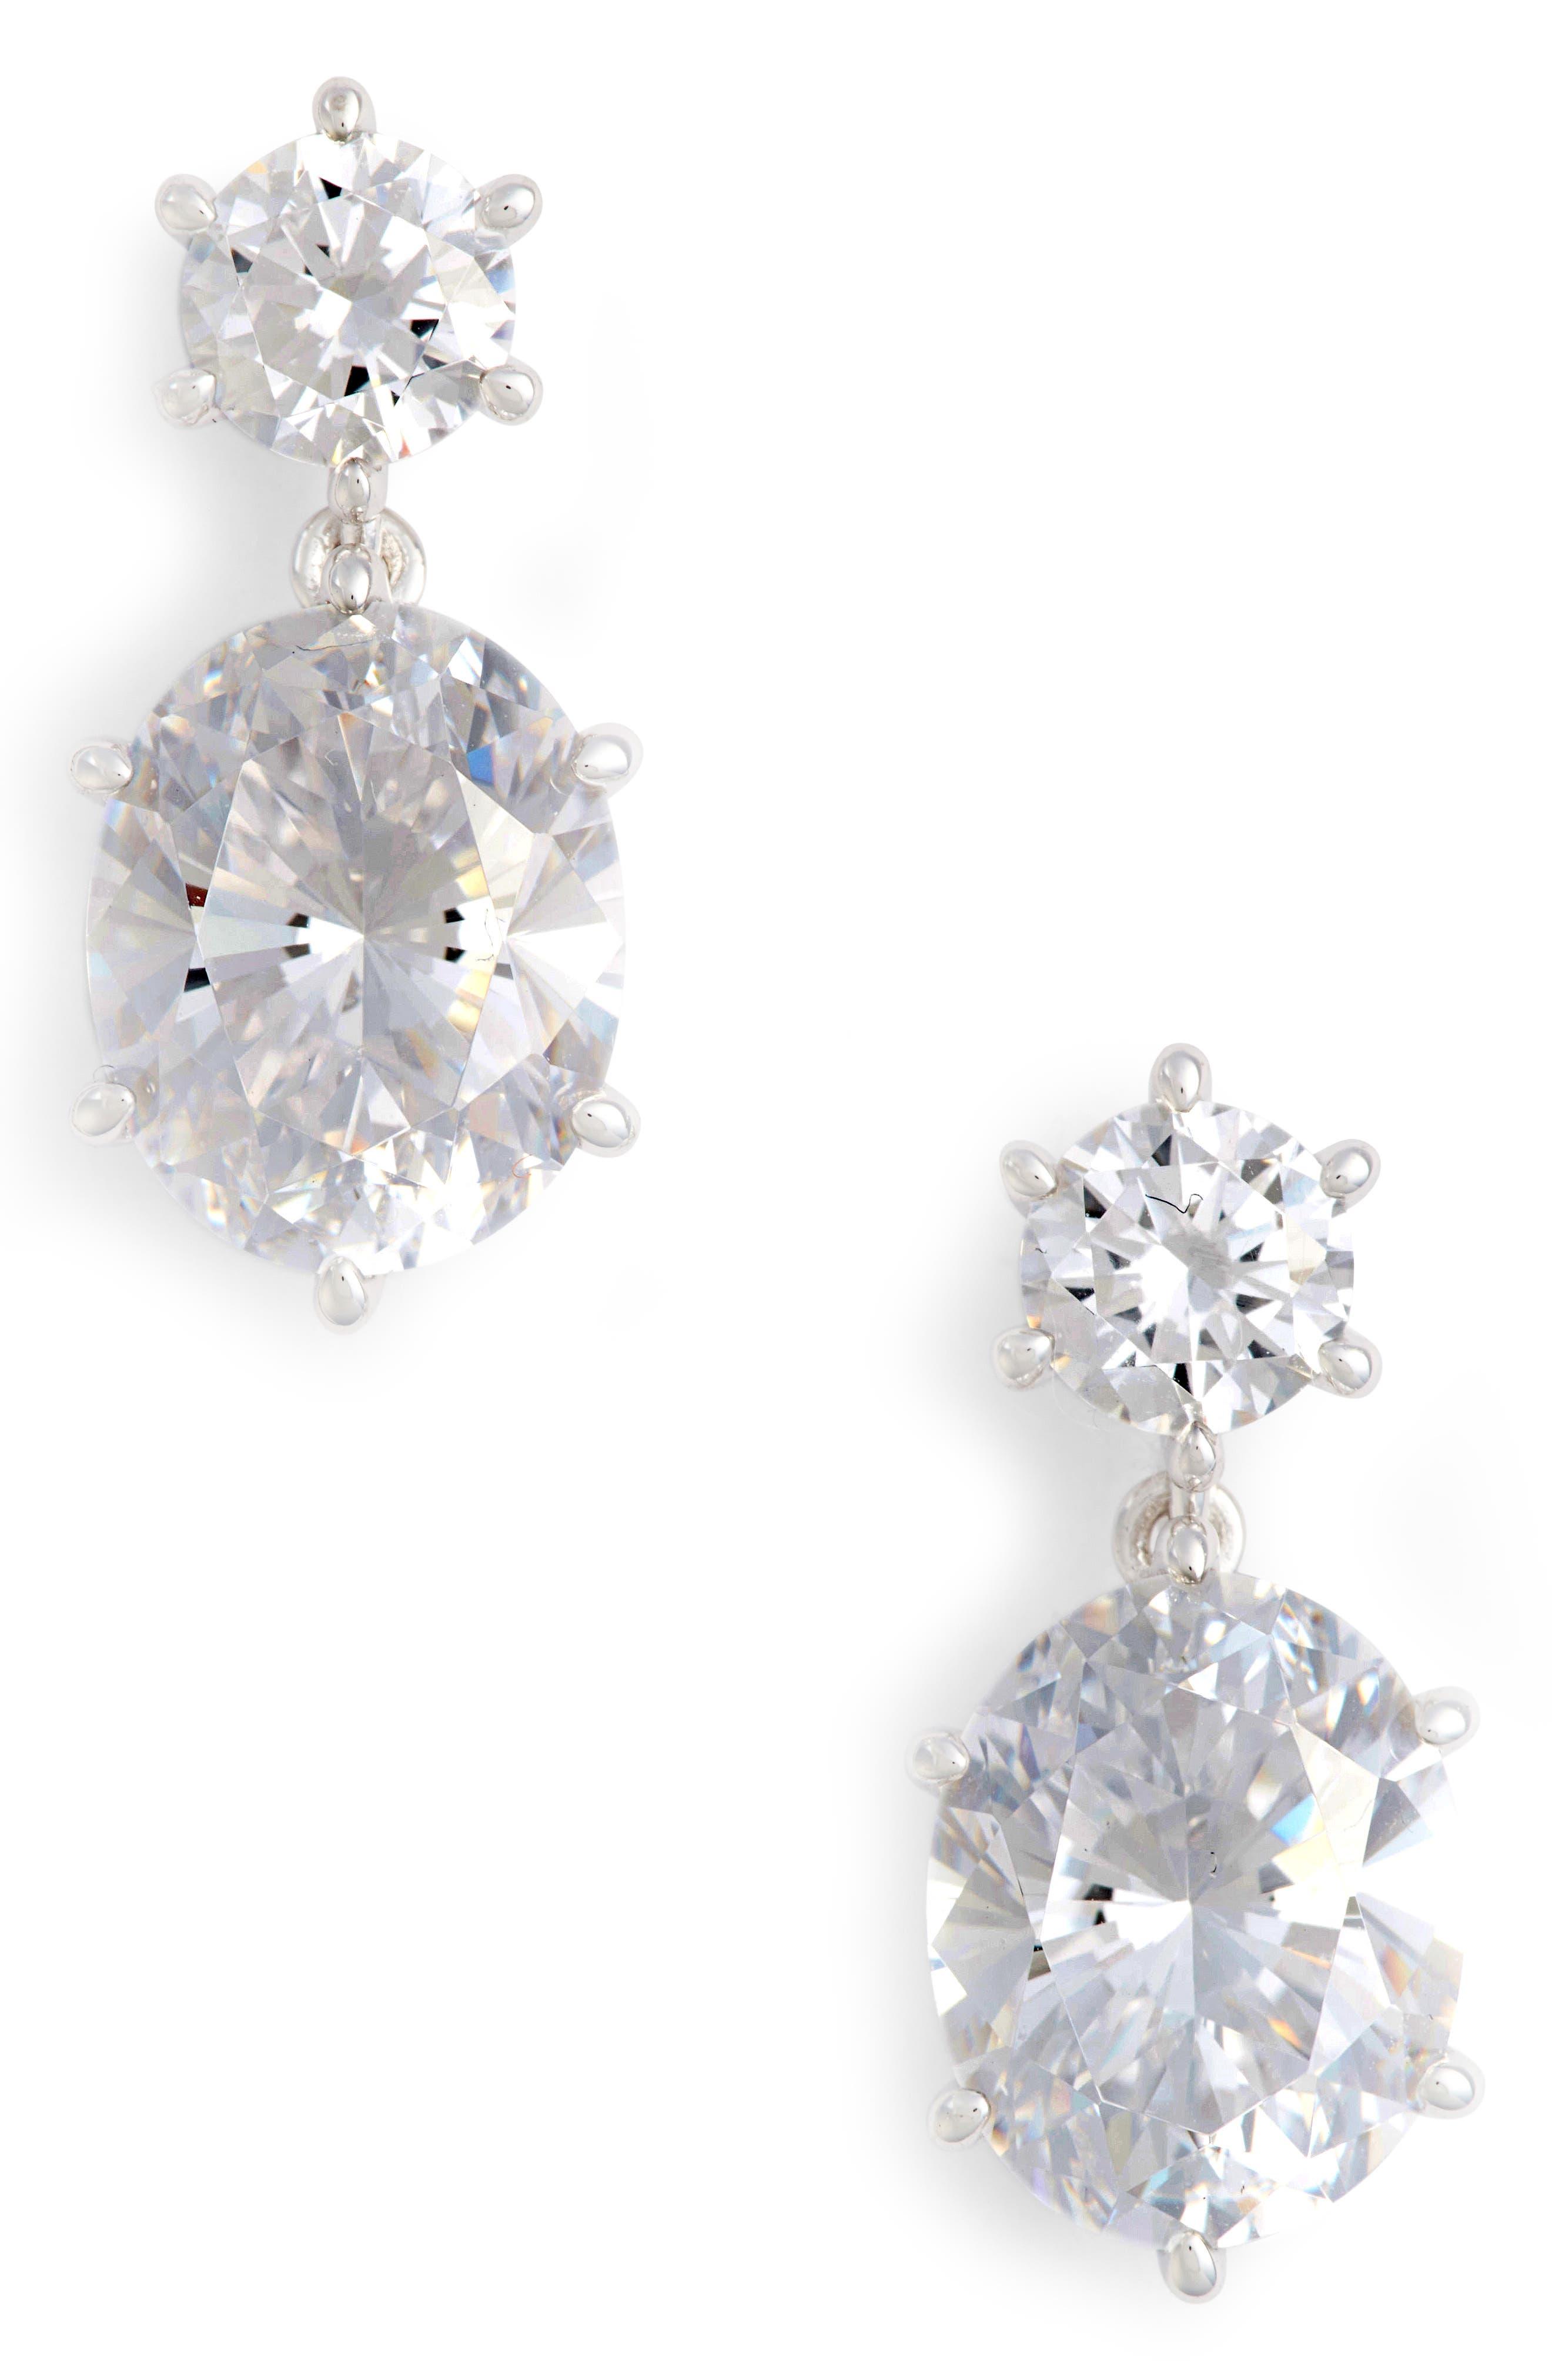 Royale Cubic Zirconia Drop Earrings,                         Main,                         color, Silver